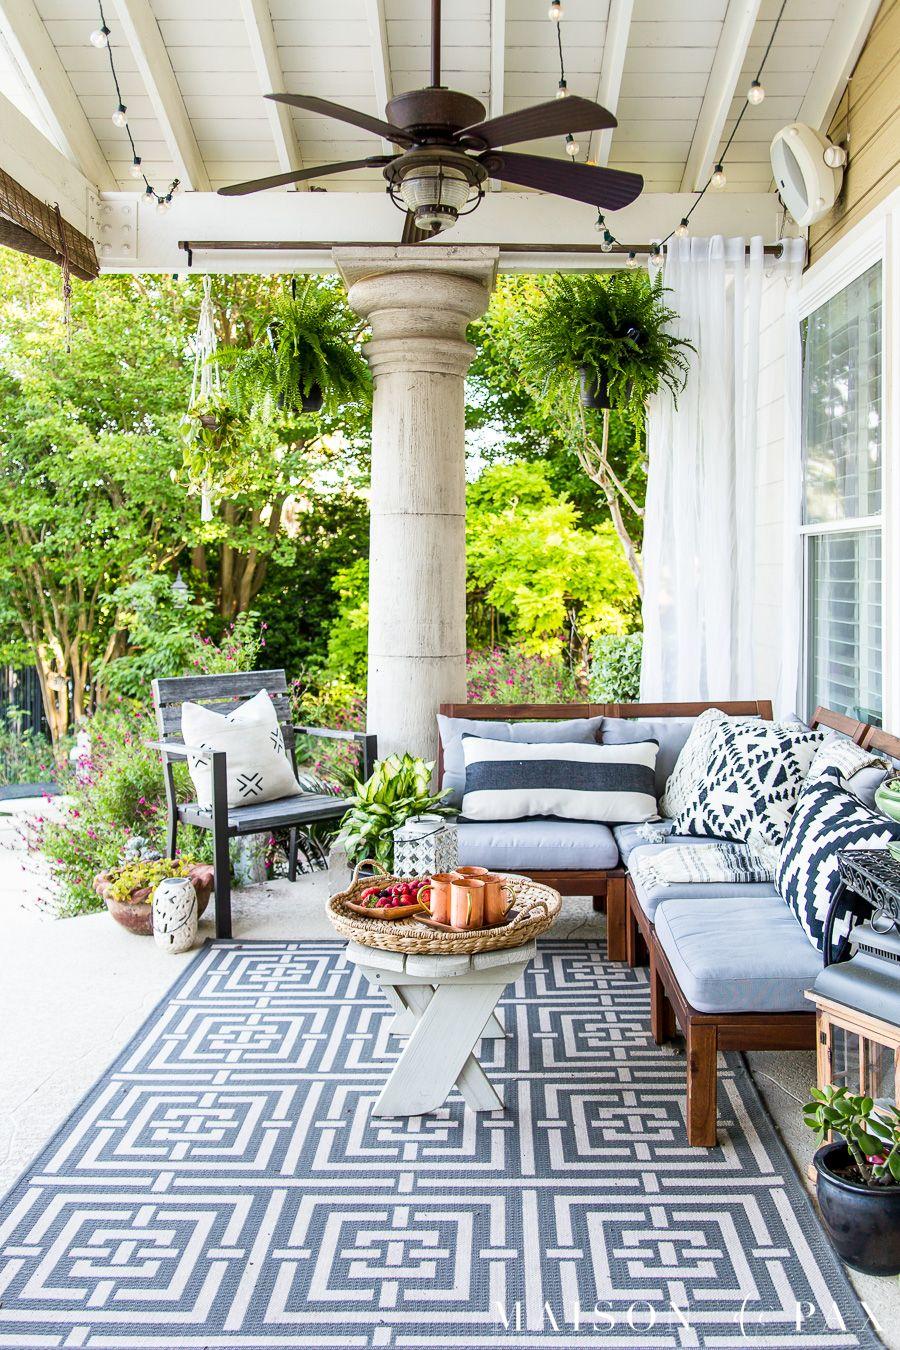 Summer Porch Decor Ideas Ferns And Succulents Maison De Pax Summer Outdoor Decor Summer Porch Decor Summer Patio